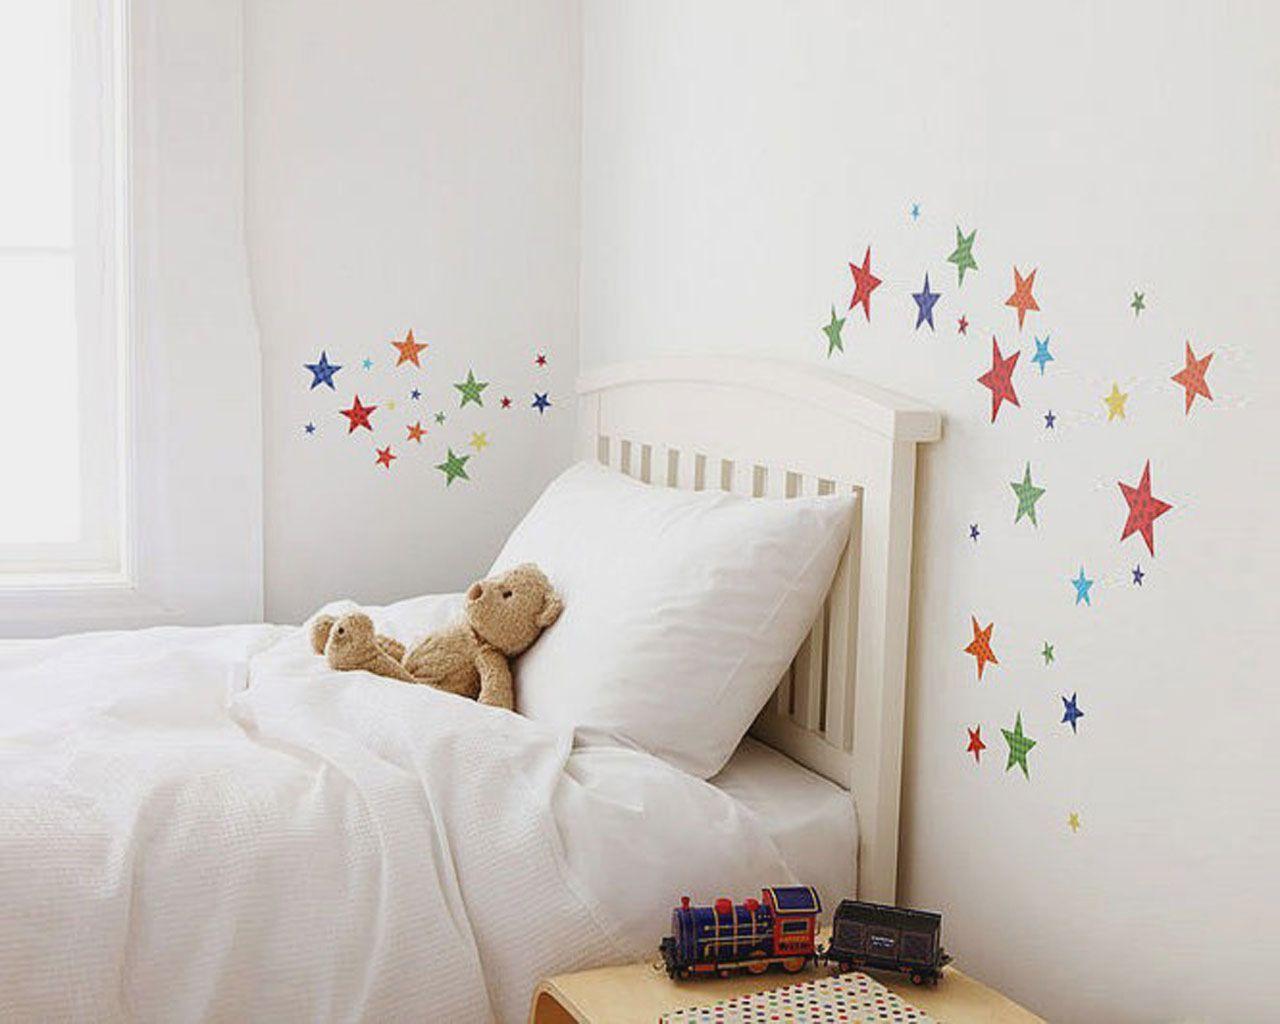 Childrens Bedroom Wall Designs Amusing Childrens Bedroom Wall Designs  Httptoples23201607 Design Decoration